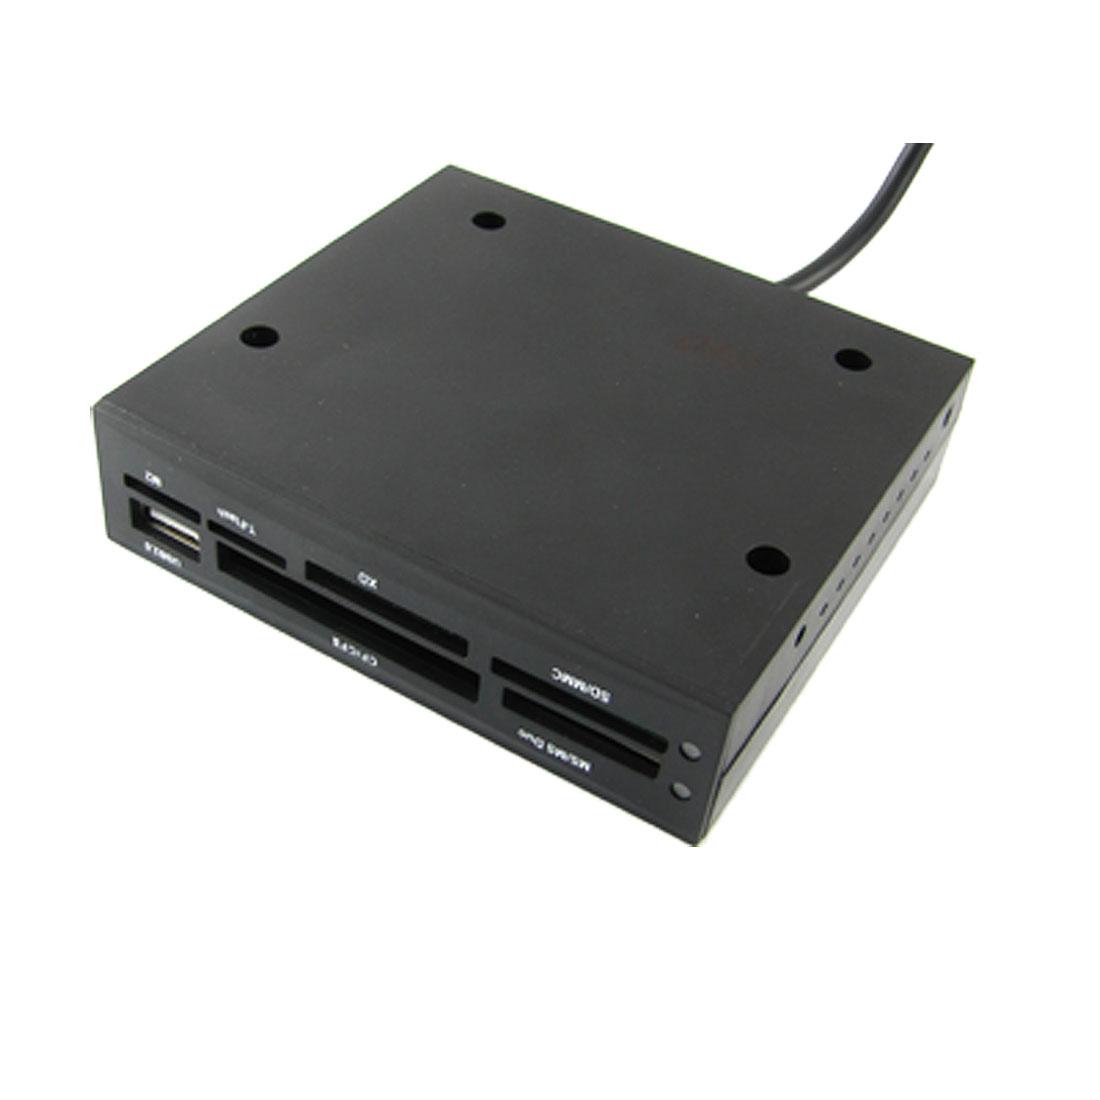 Black Square USB 2.0 Internal Card Reader Writer